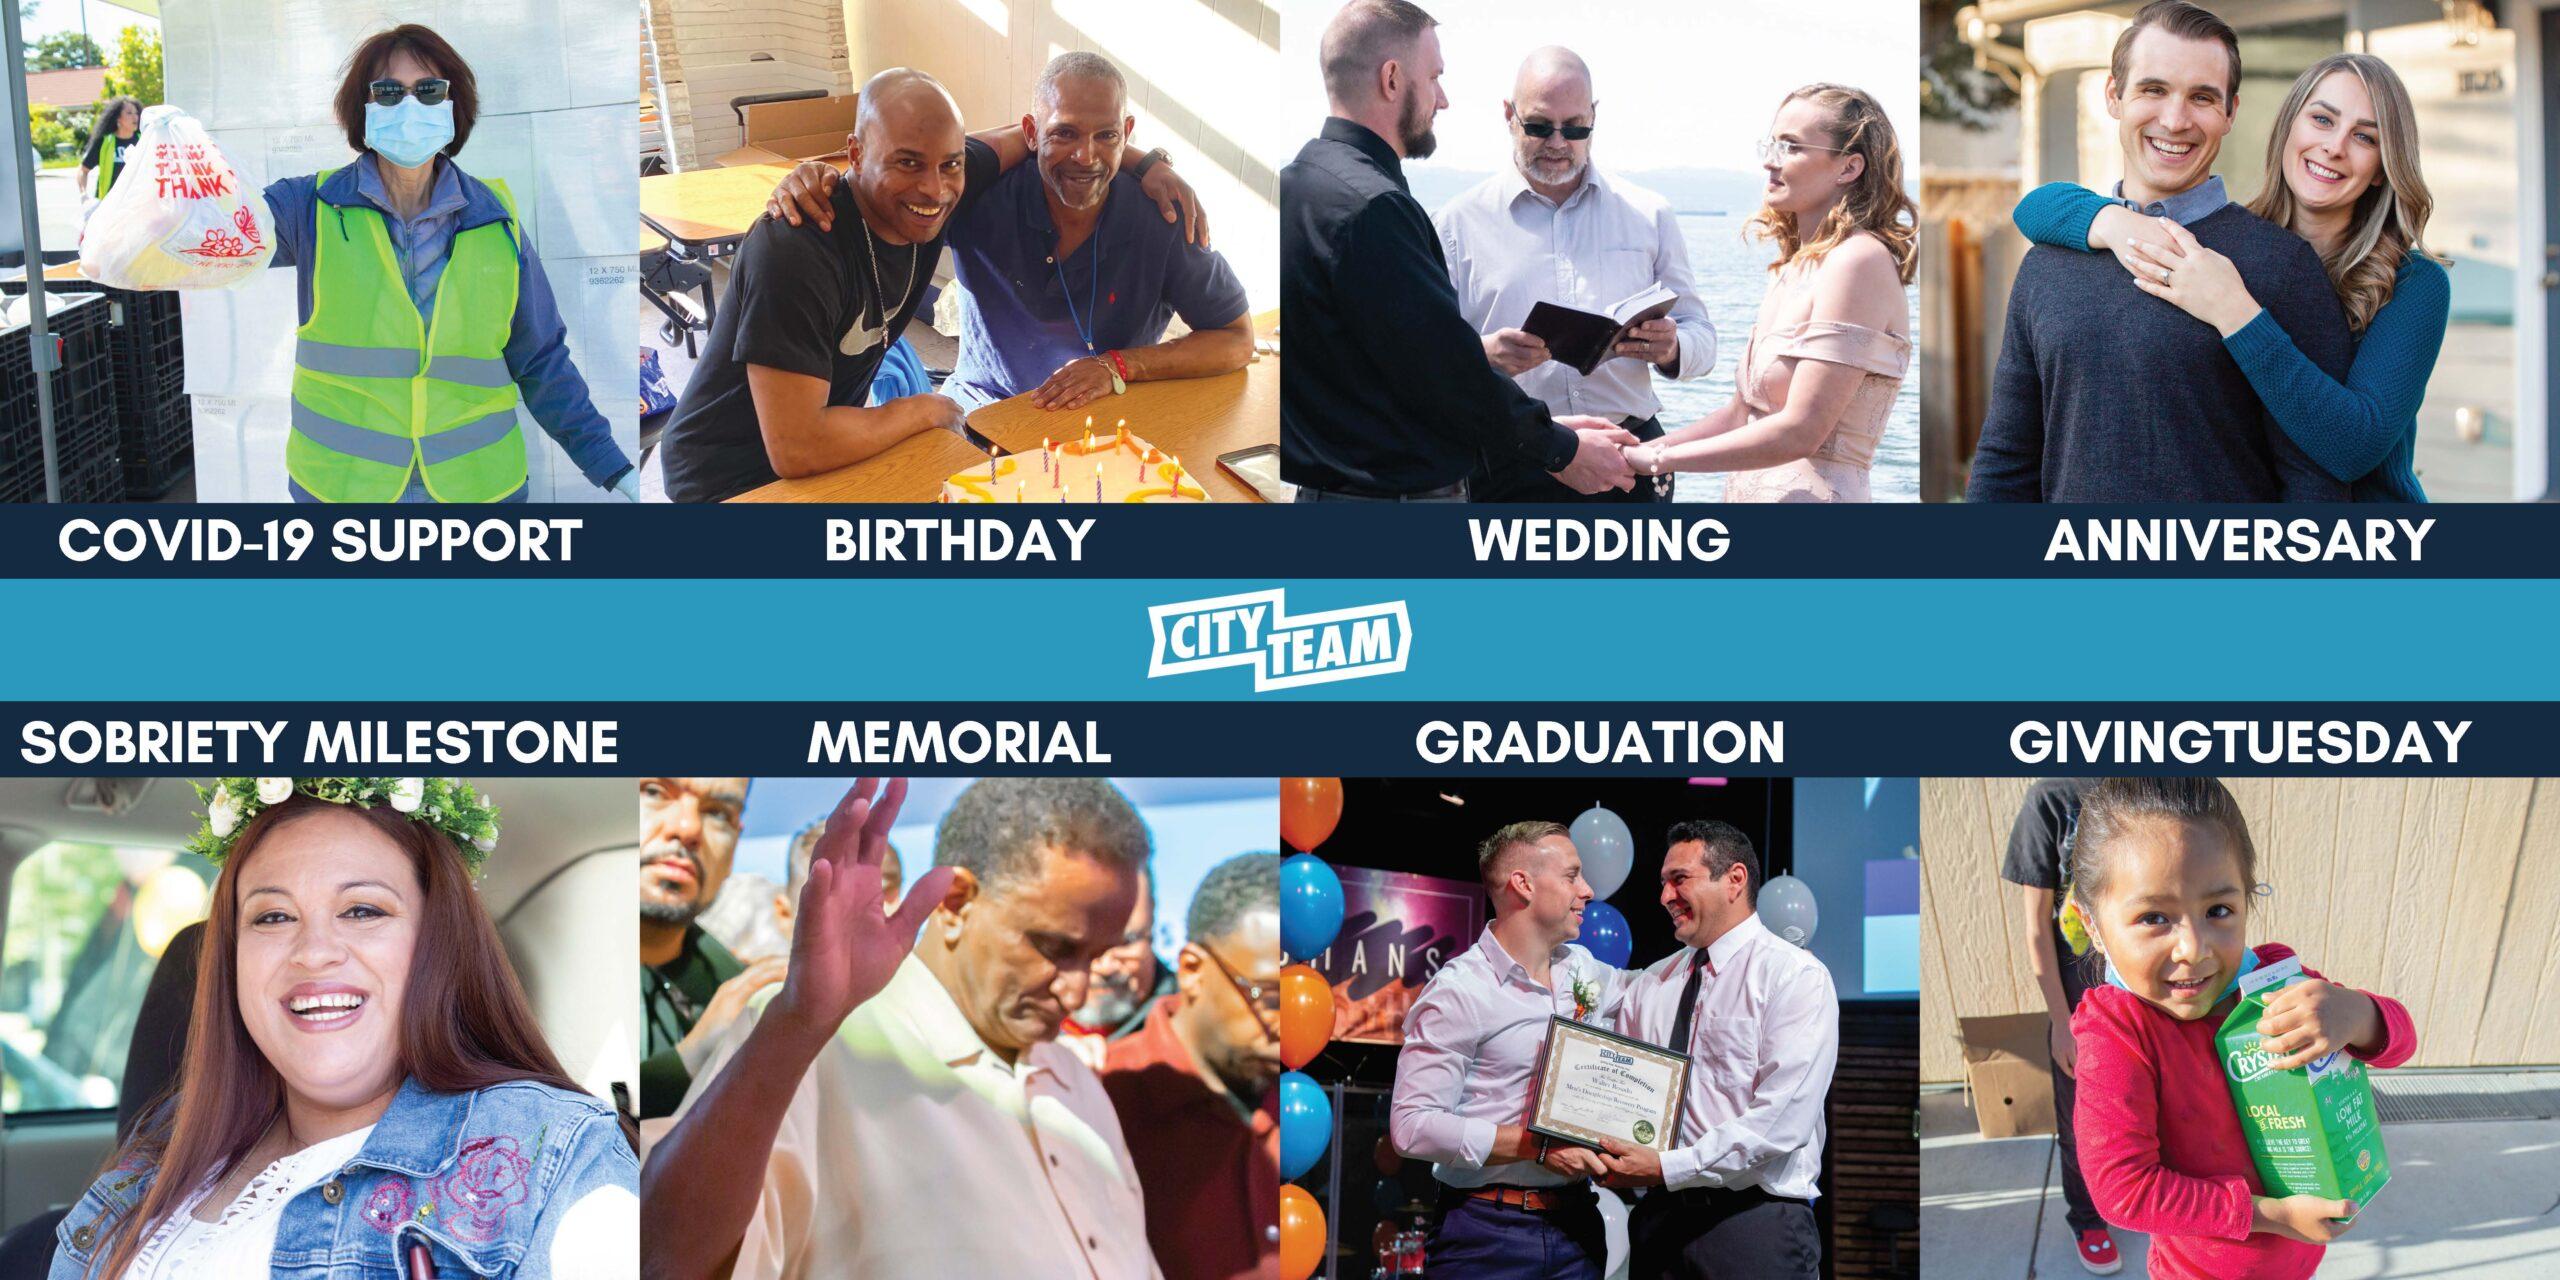 COVID-19 Support, Birthday, Wedding, Anniversary, Sobriety Milestone, Memorial, Graduation, GivingTuesday